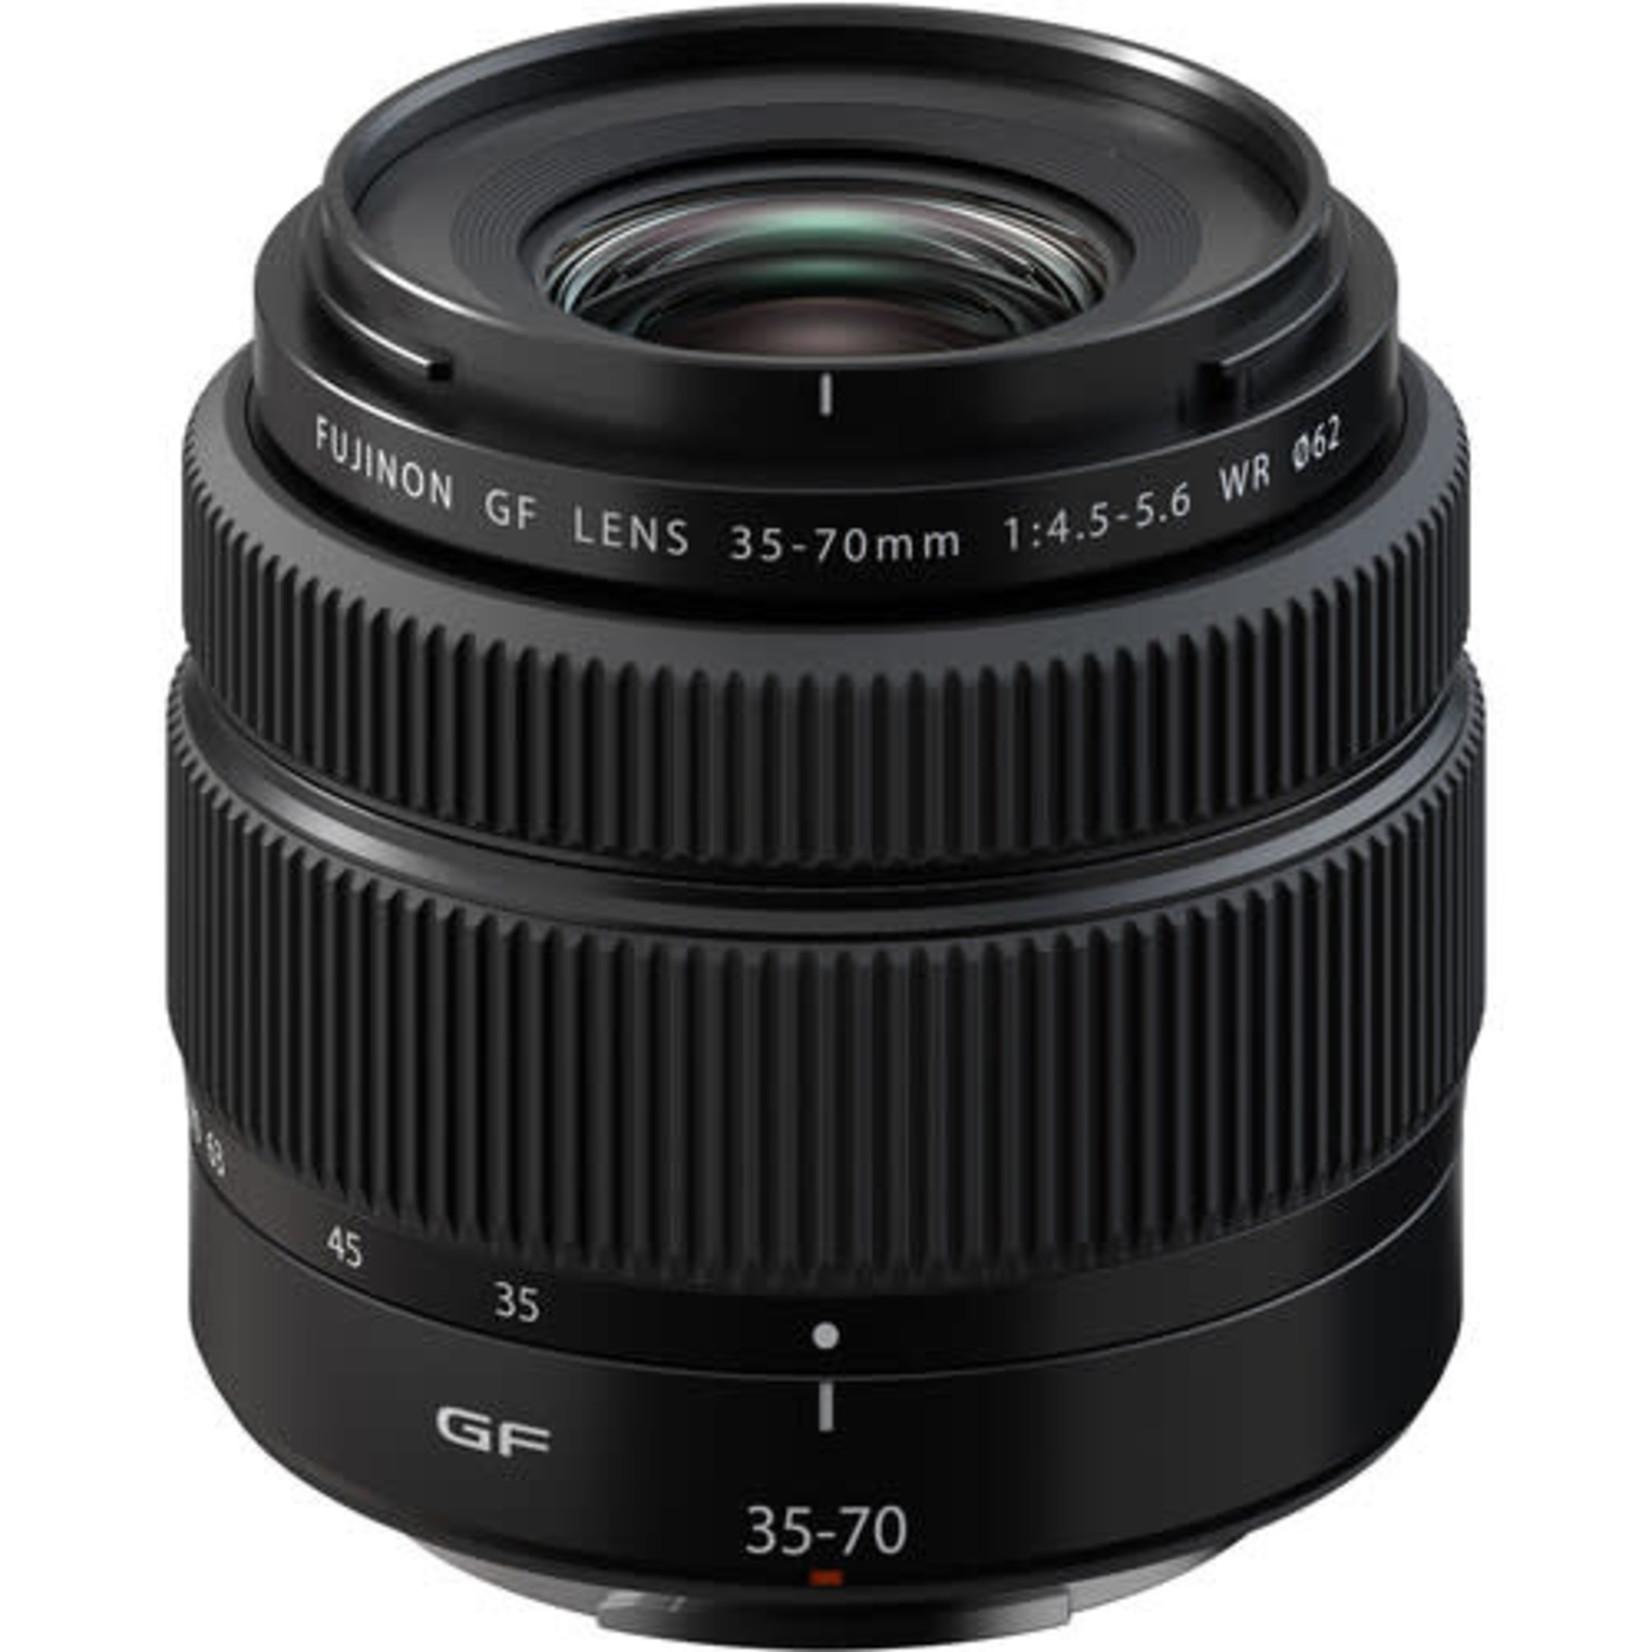 FujiFilm FUJIFILM GF 35-70mm f/4.5-5.6 WR Lens